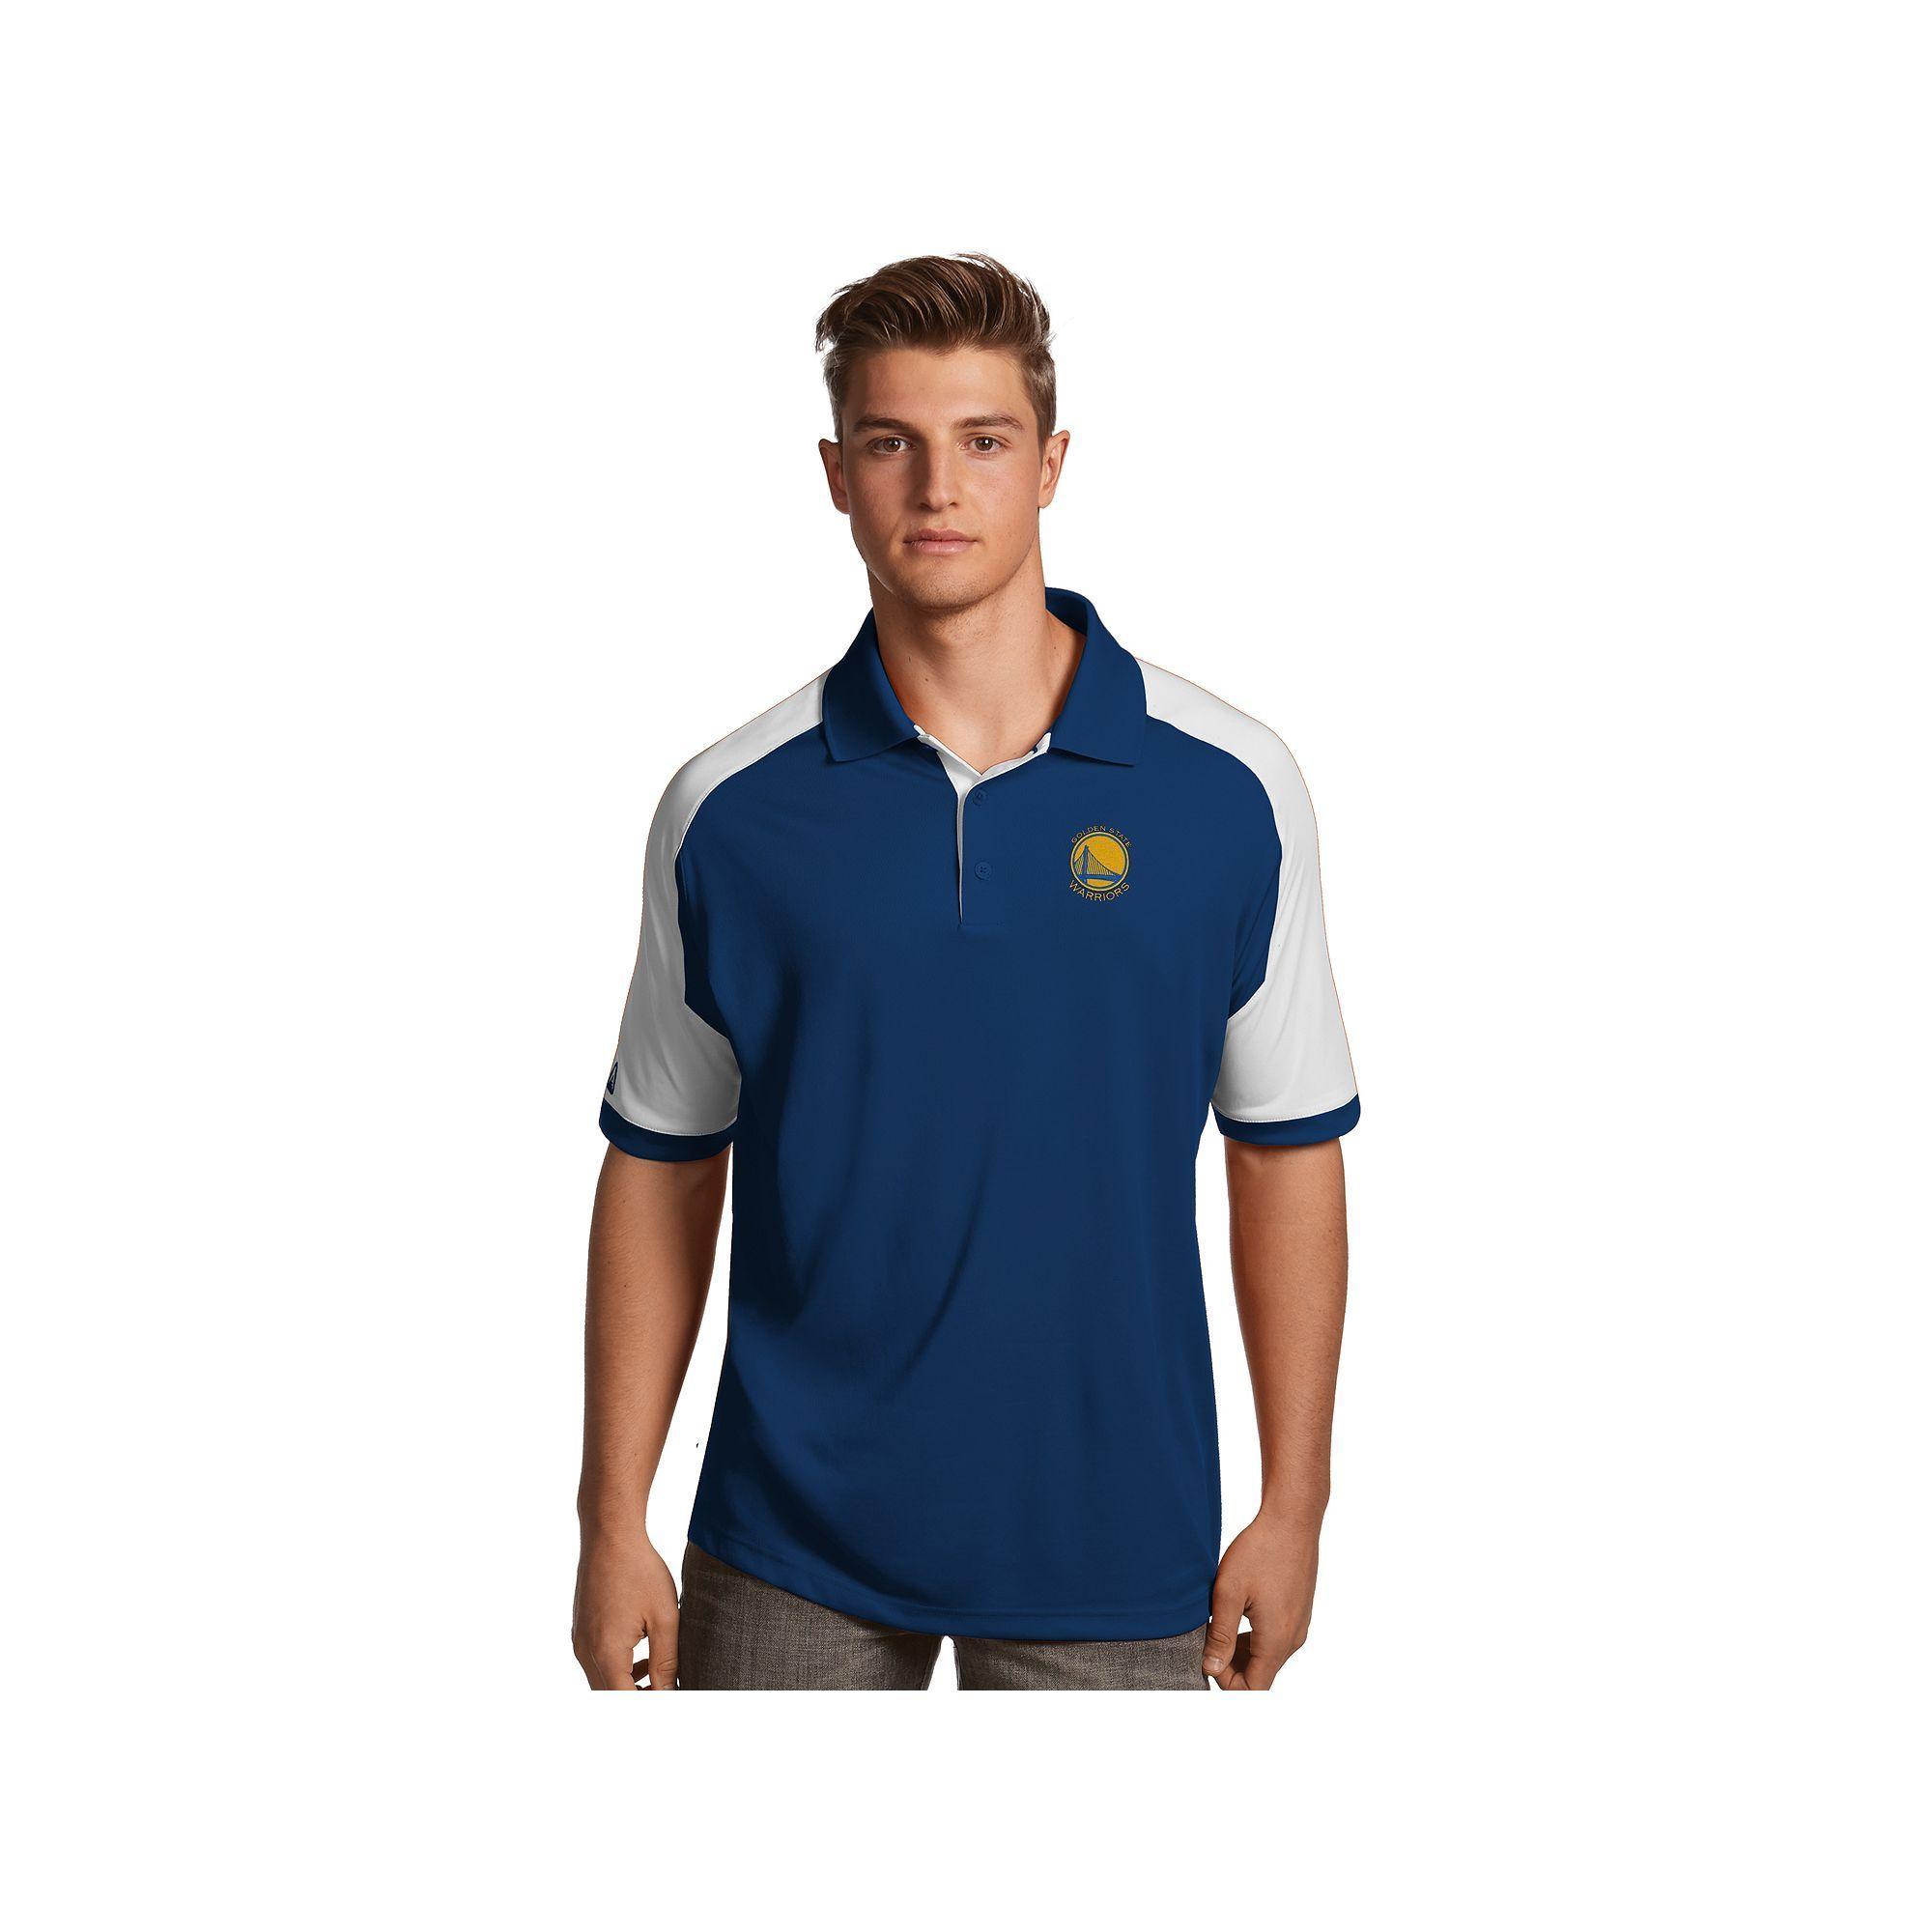 Men's Antigua Golden State Warriors Century Polo, Size: Medium, Blue